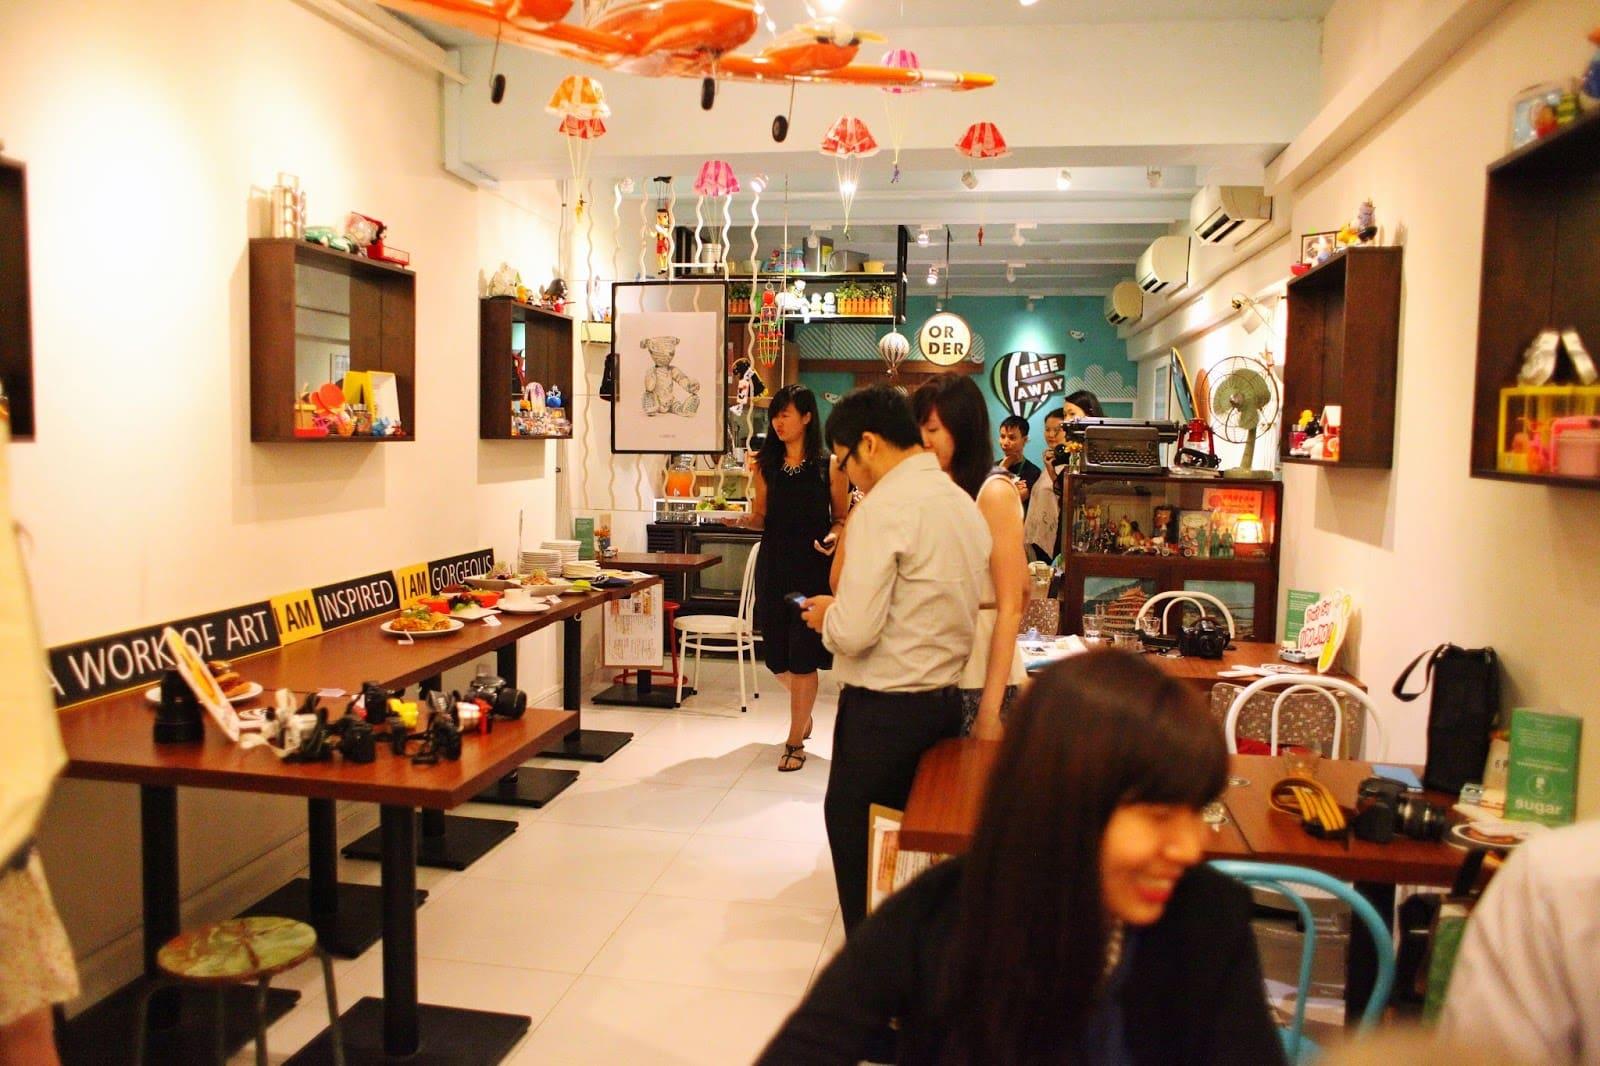 quán cafe ở singapore: flee away cafe